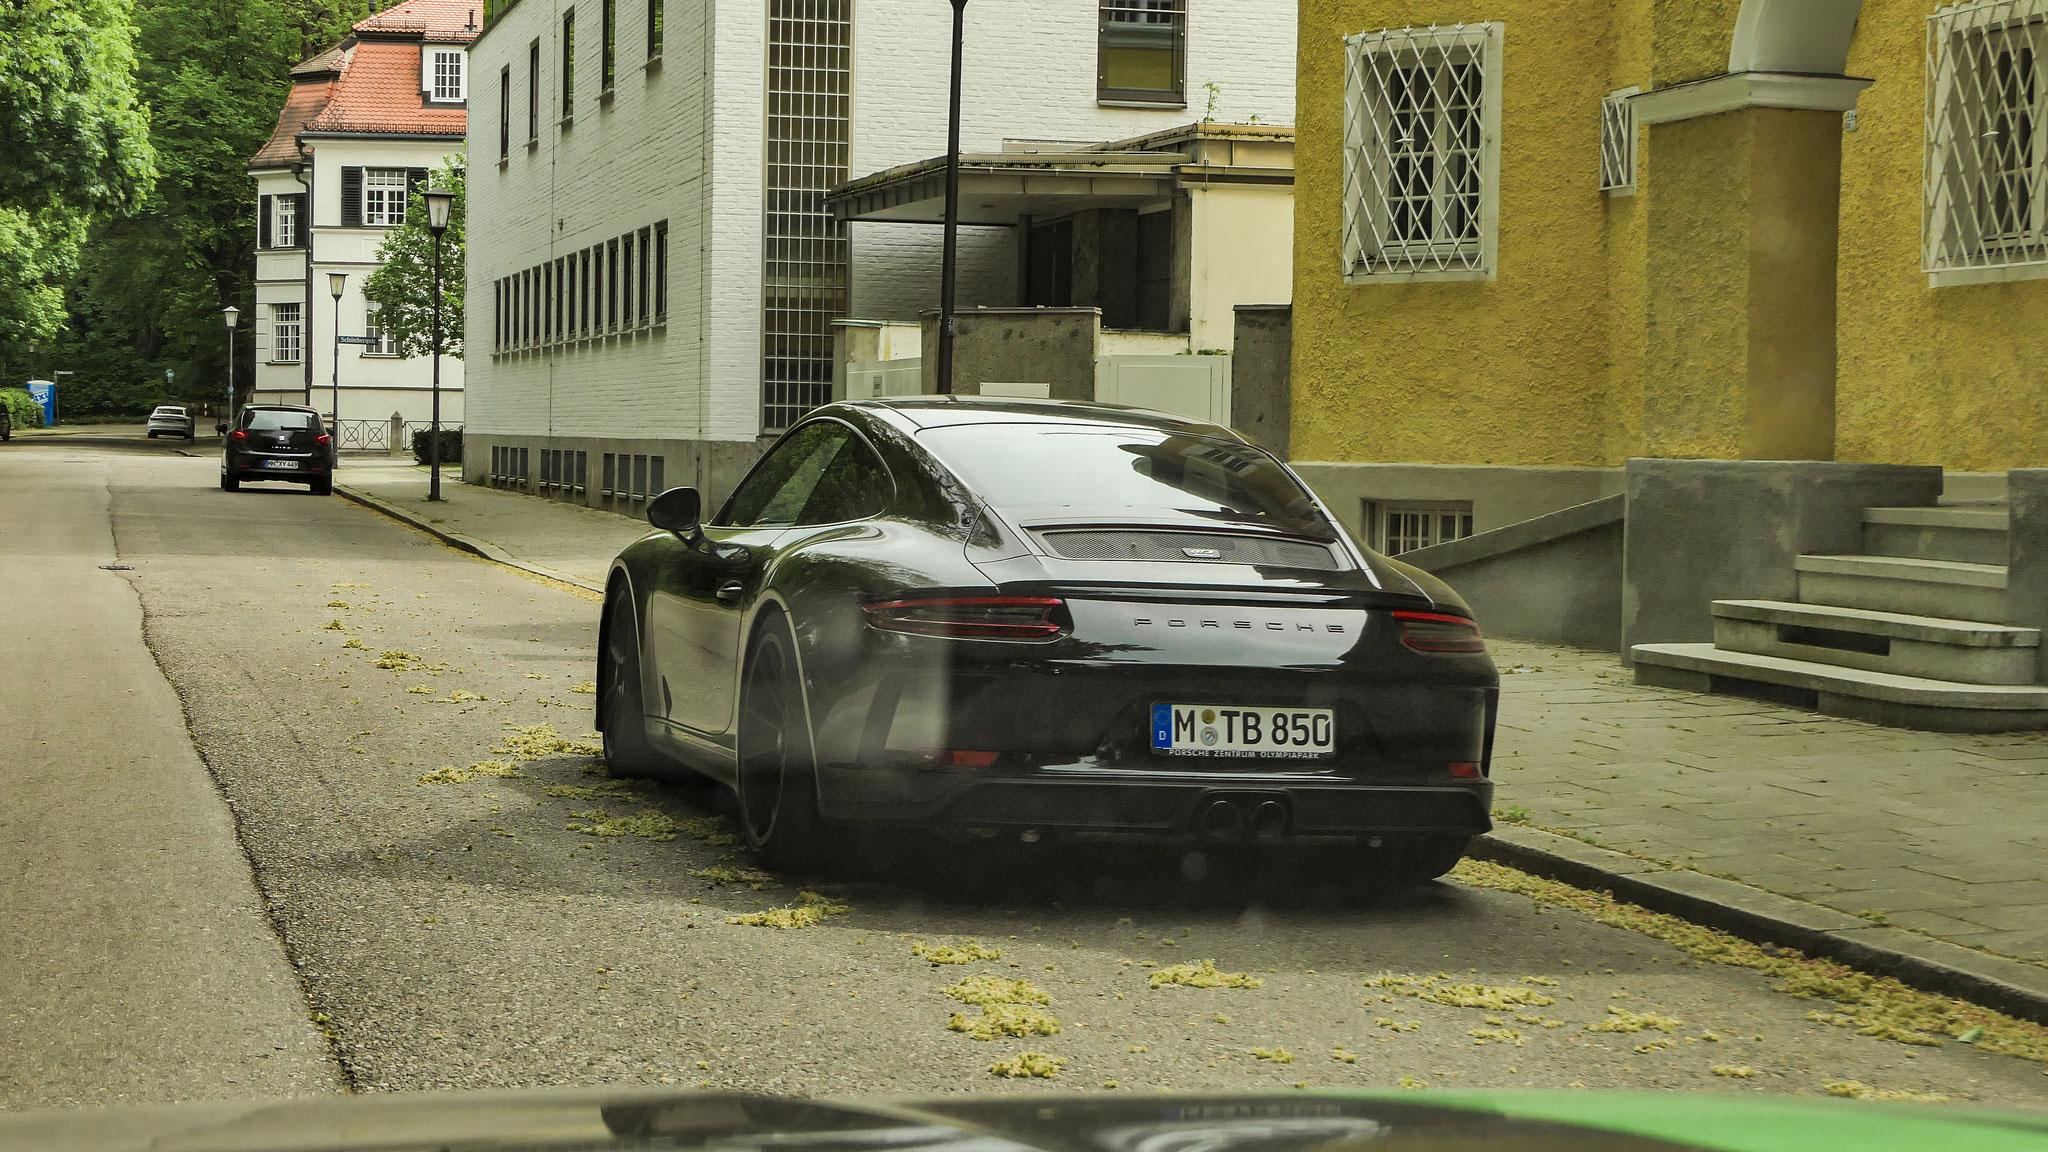 Porsche 991 GT3 Touring Package - M-TB-850